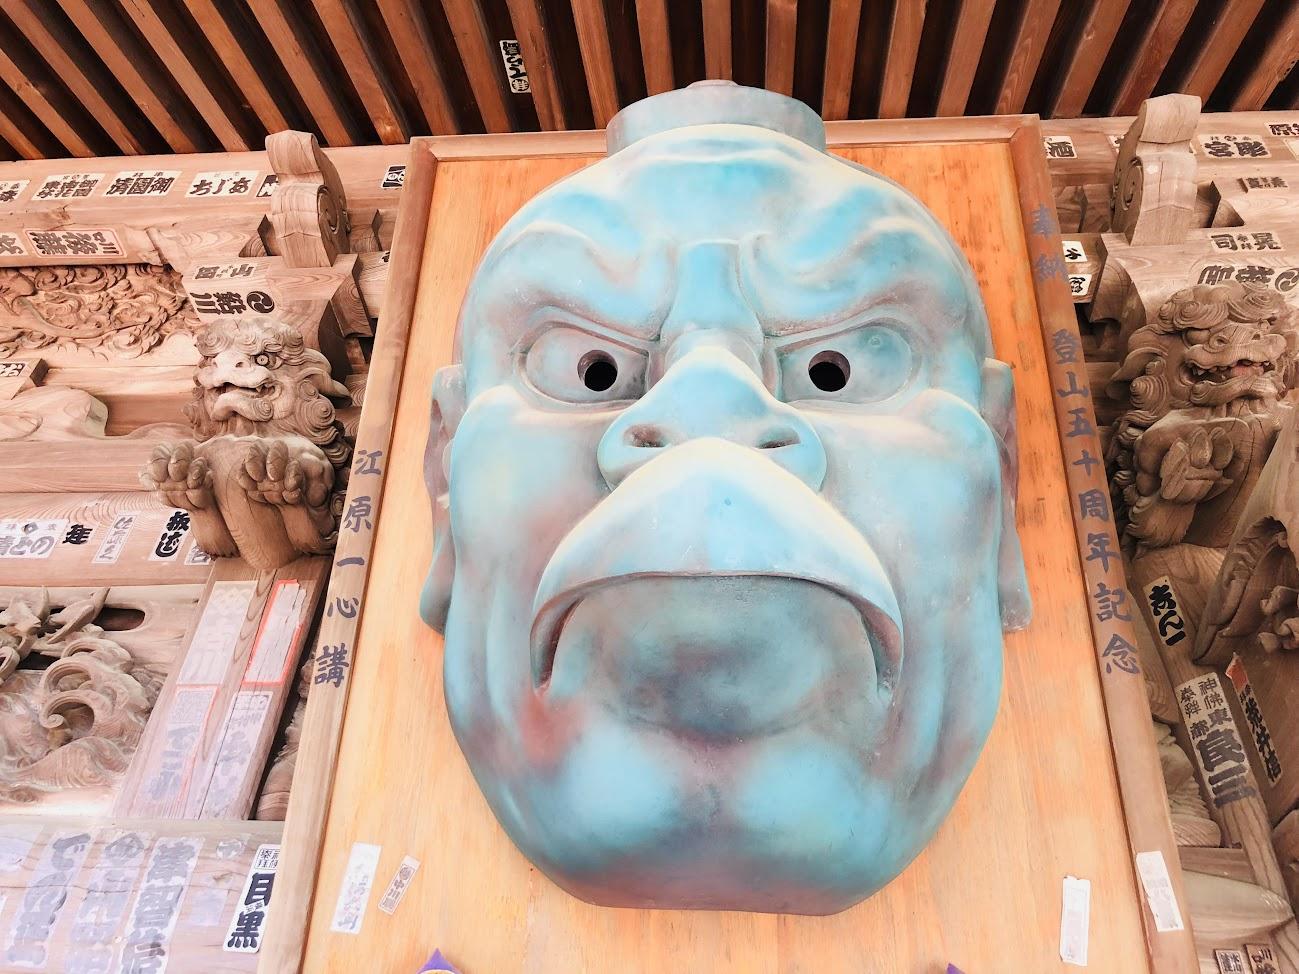 A giant tengu face